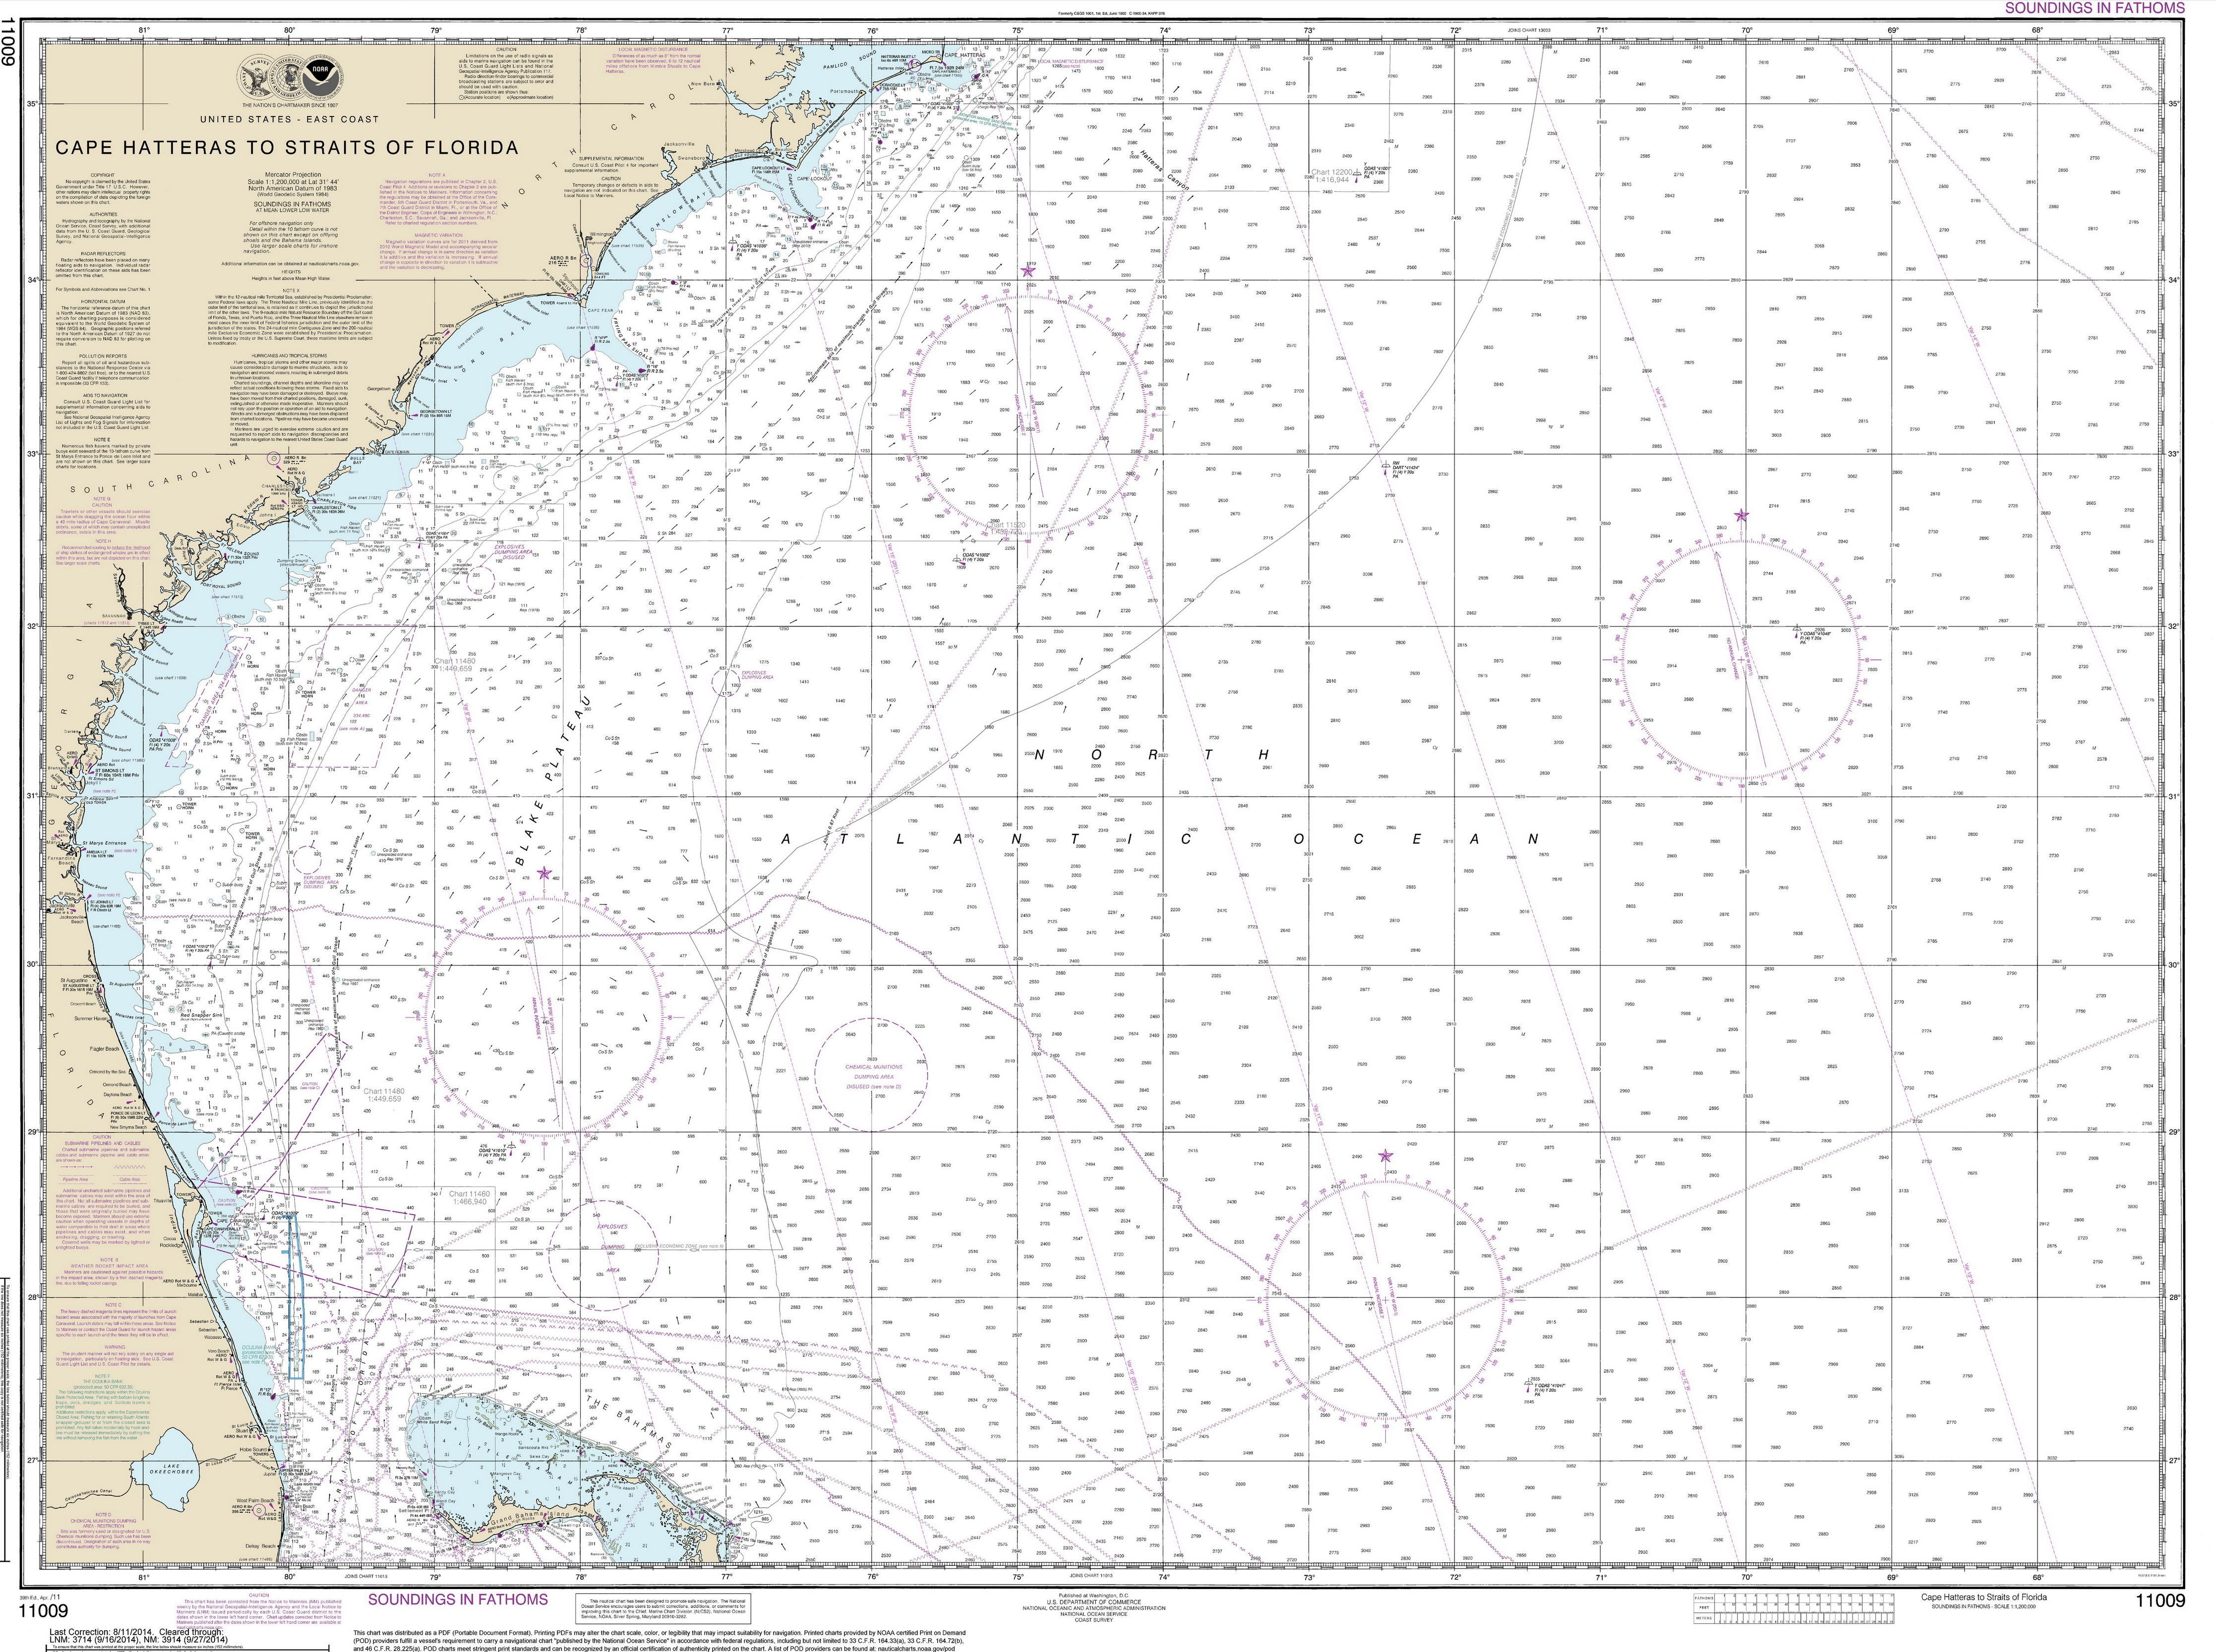 Cape Hatteras To Straits Of Florida Chart 11009 Original Size 36 X 48 50 24 X 32 30 18 X 24 20